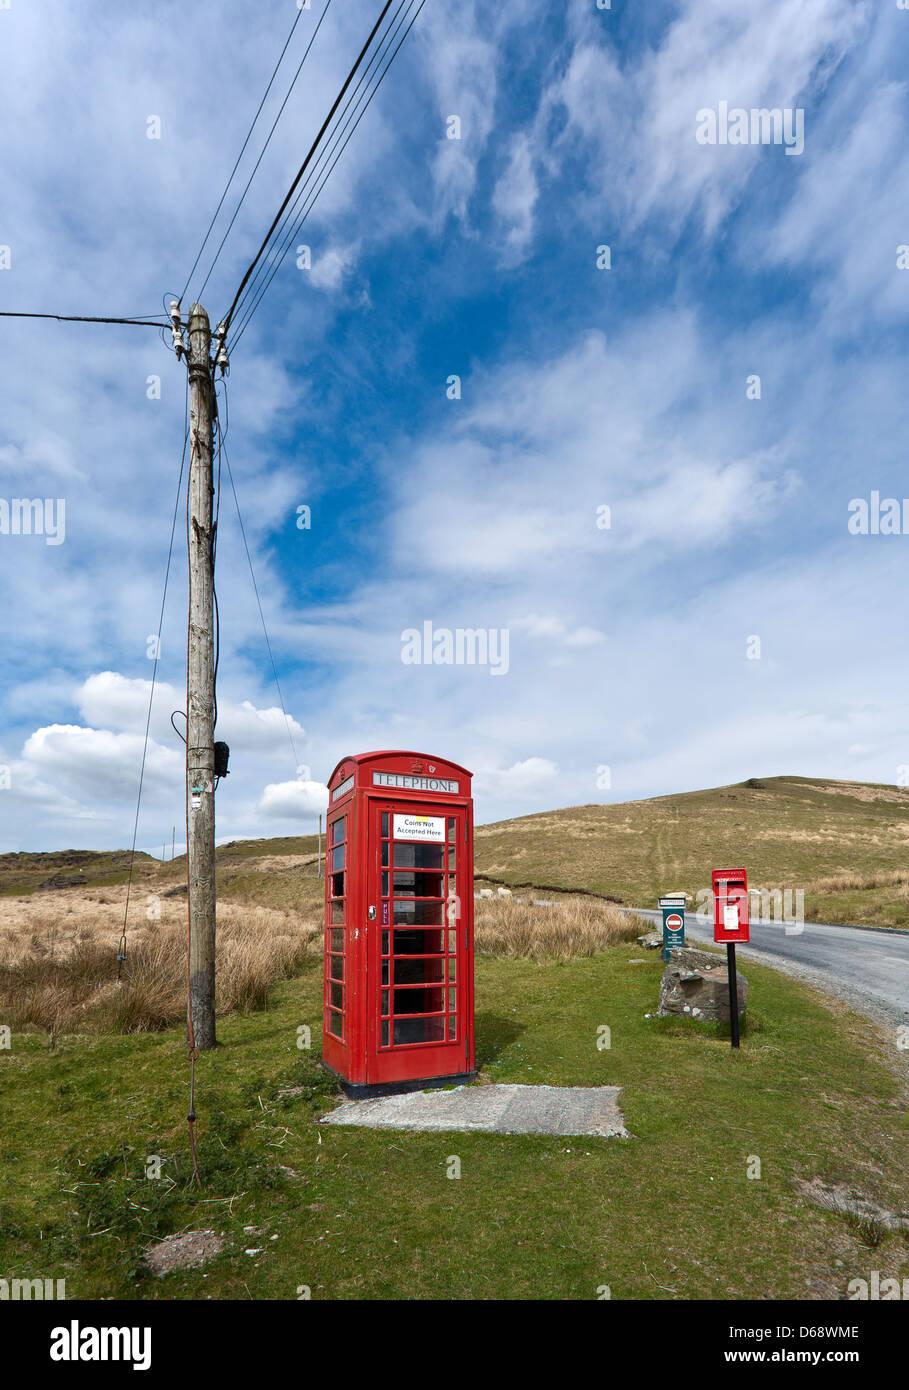 Remote vandalised K6 red telephone kiosk near Tregarron, Powys, mid Wales - Stock Image